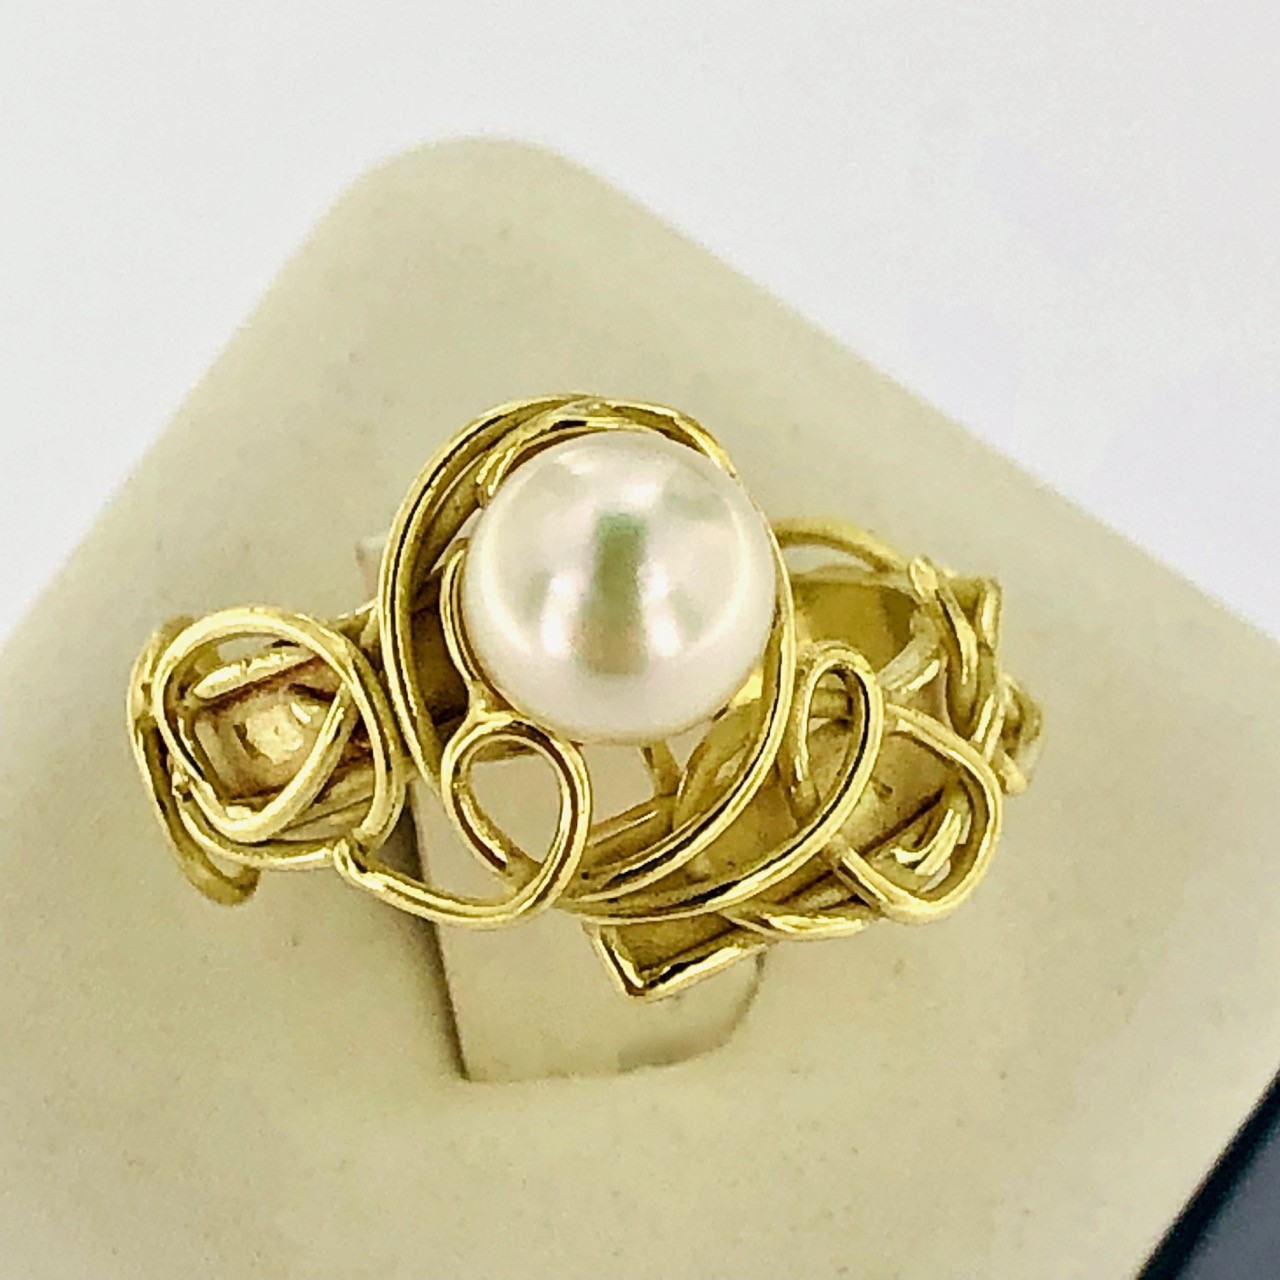 bague or jaune avec perle